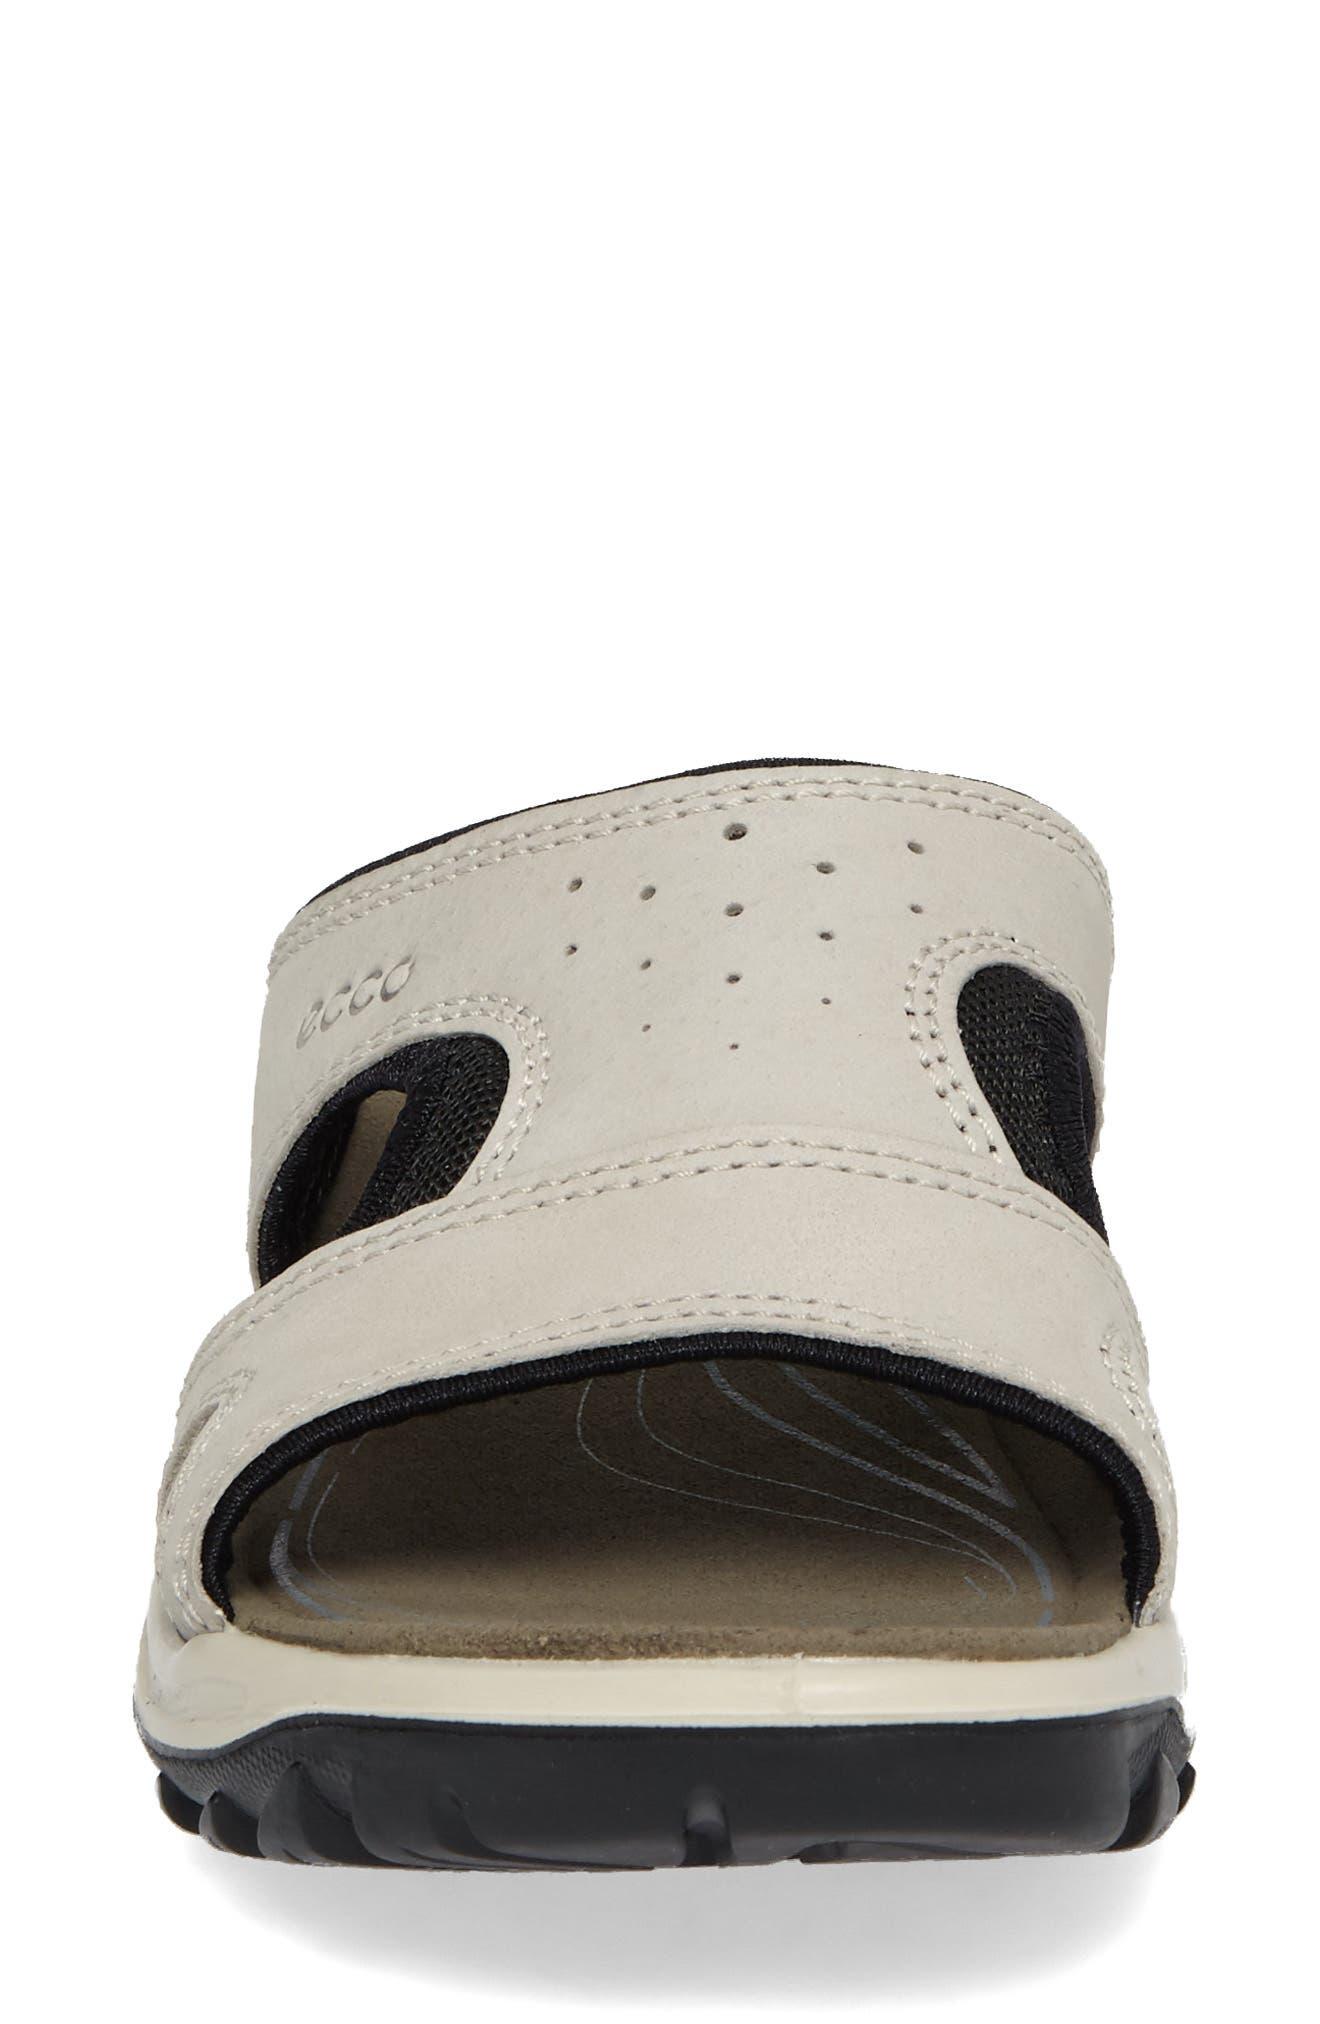 ECCO, Offroad Lite Slide Sandal, Alternate thumbnail 4, color, GRAVEL/ BLACK LEATHER